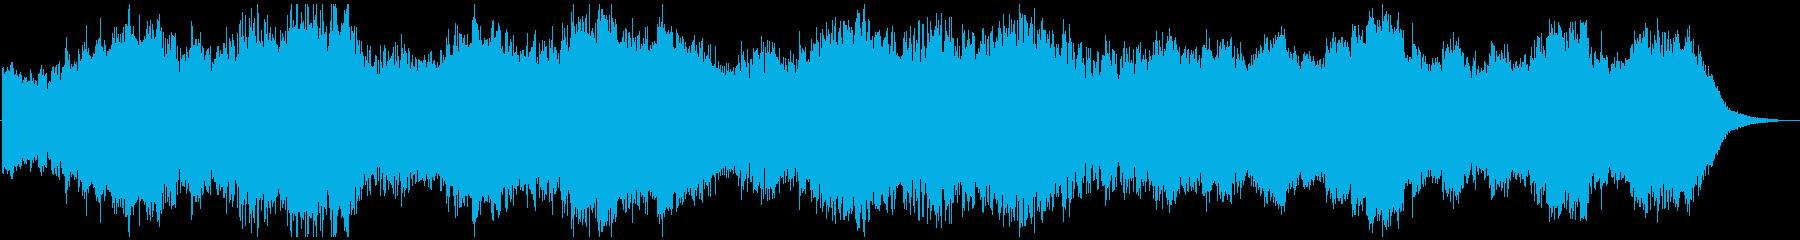 PADS 不安定なベース02の再生済みの波形